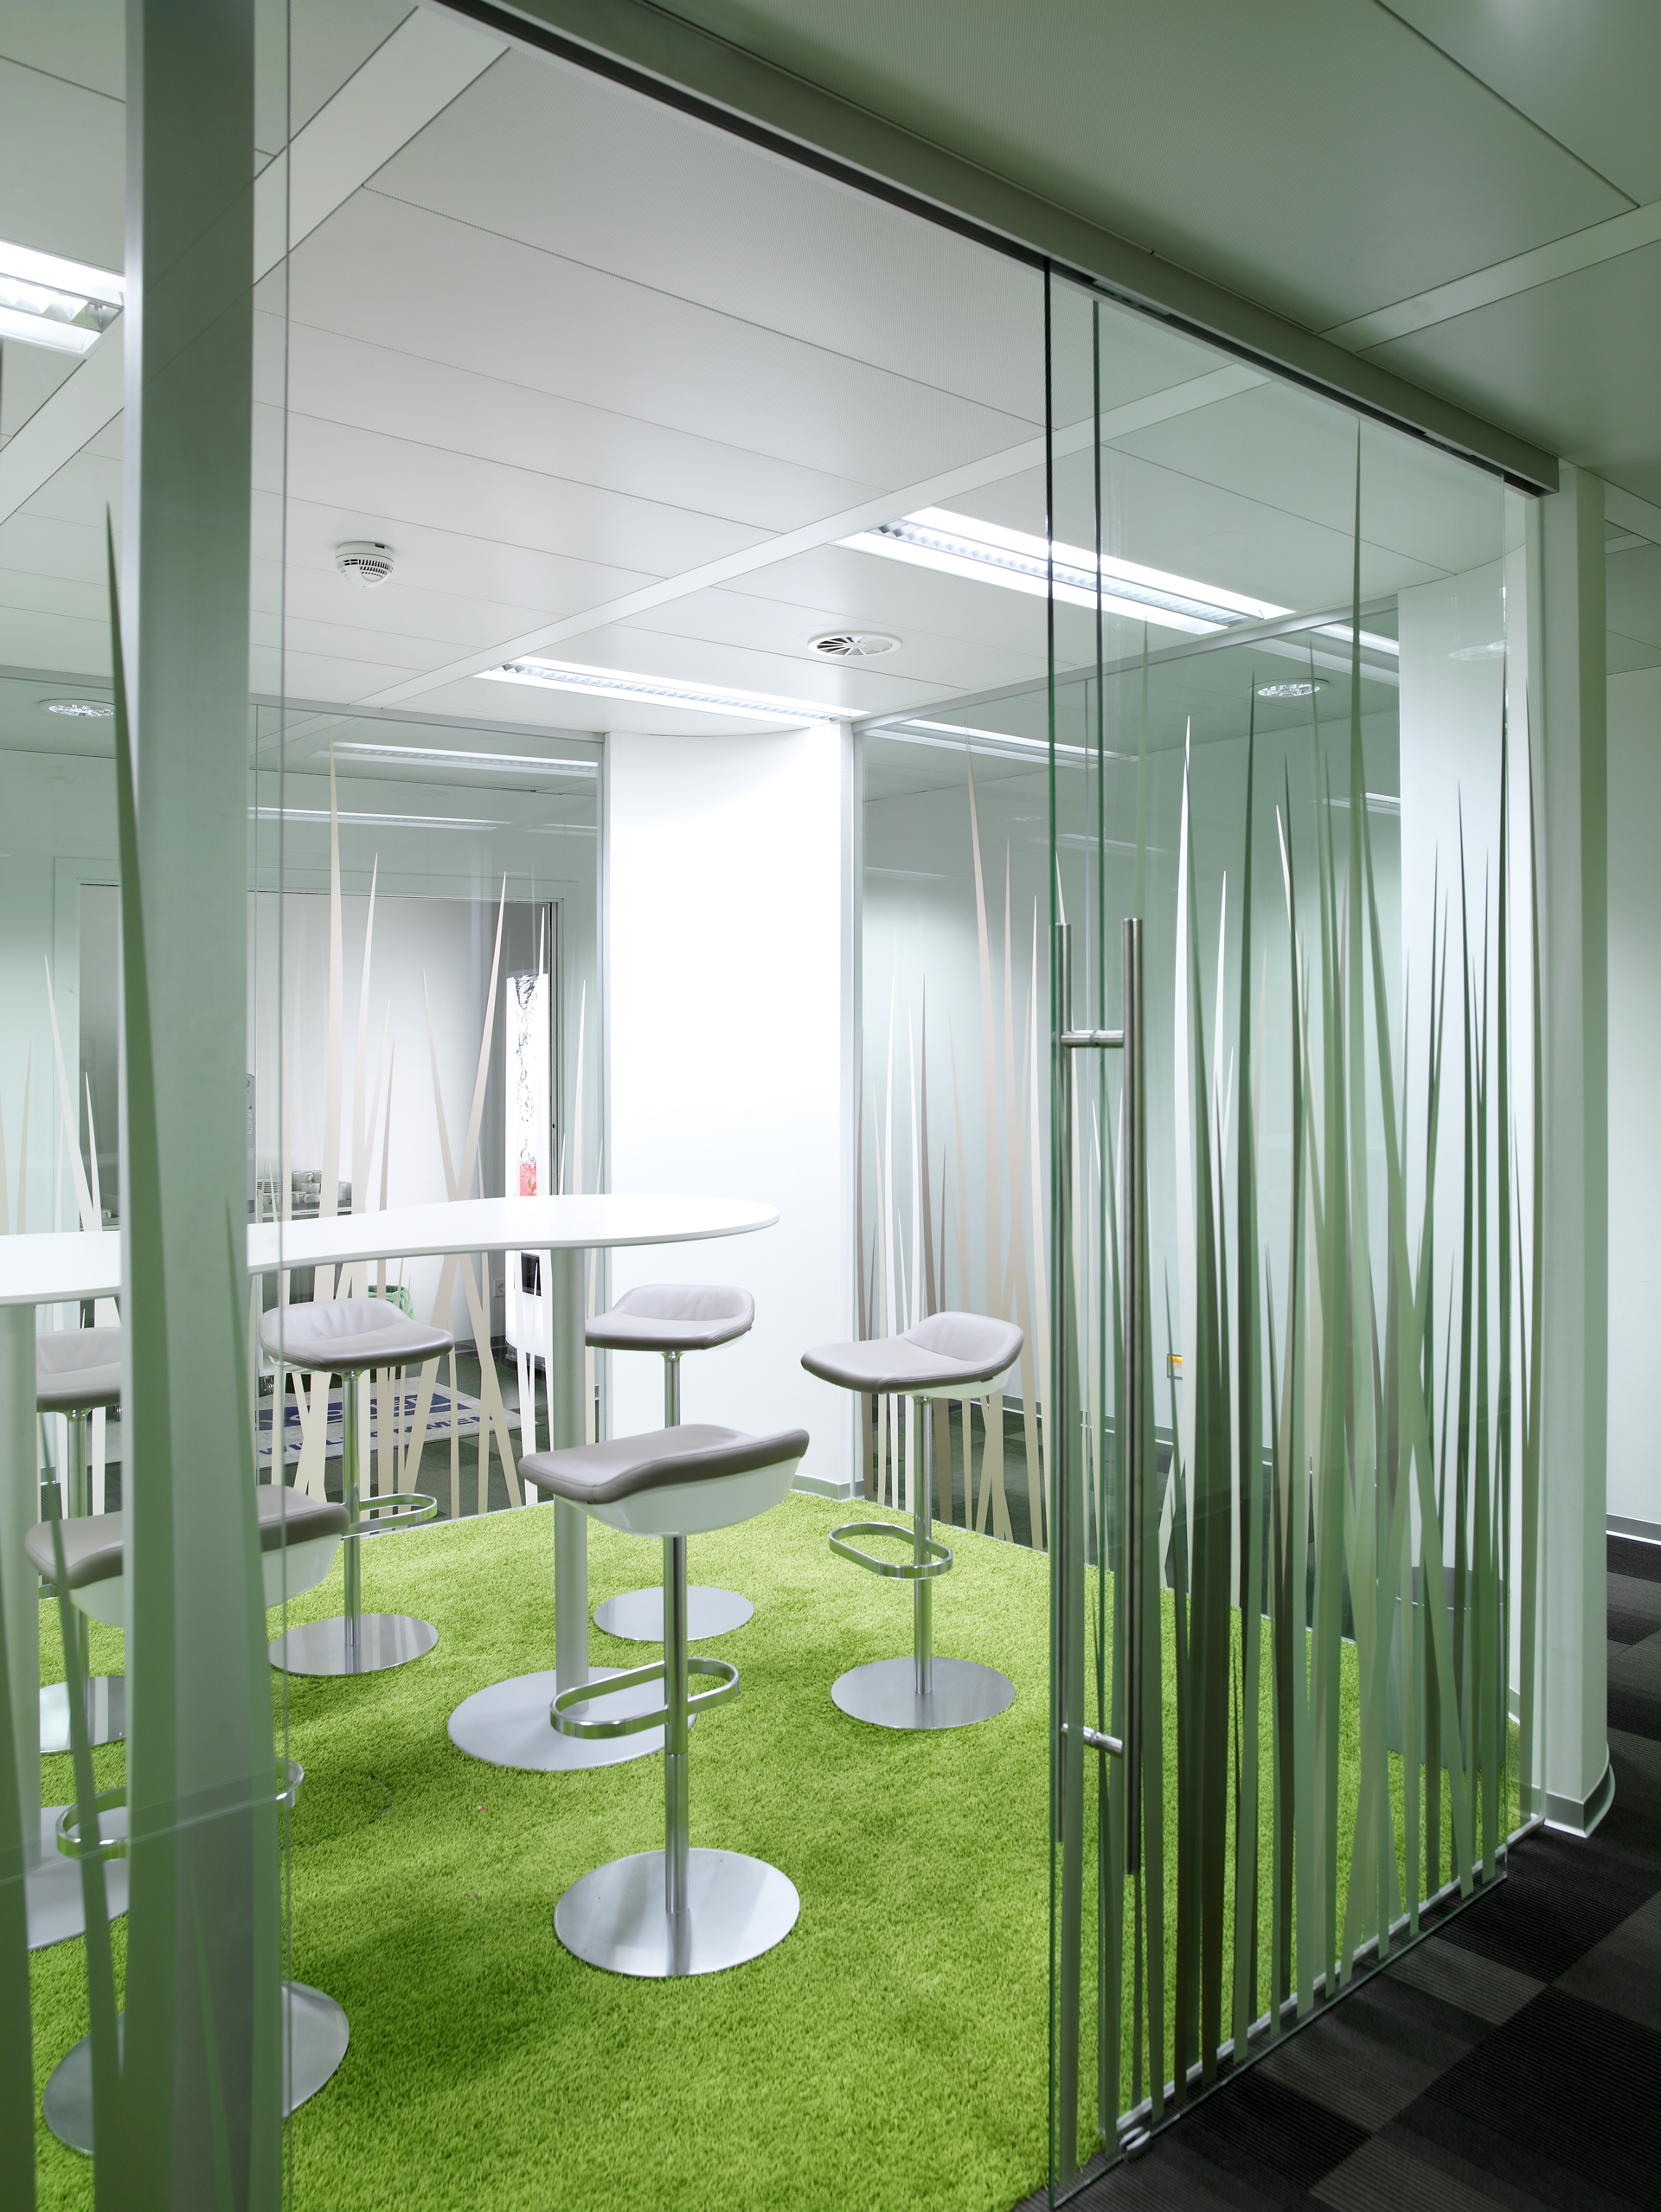 EmpfangsMeetingraum im Büro Nycomed Pharma, designed von Studio Thörnblom